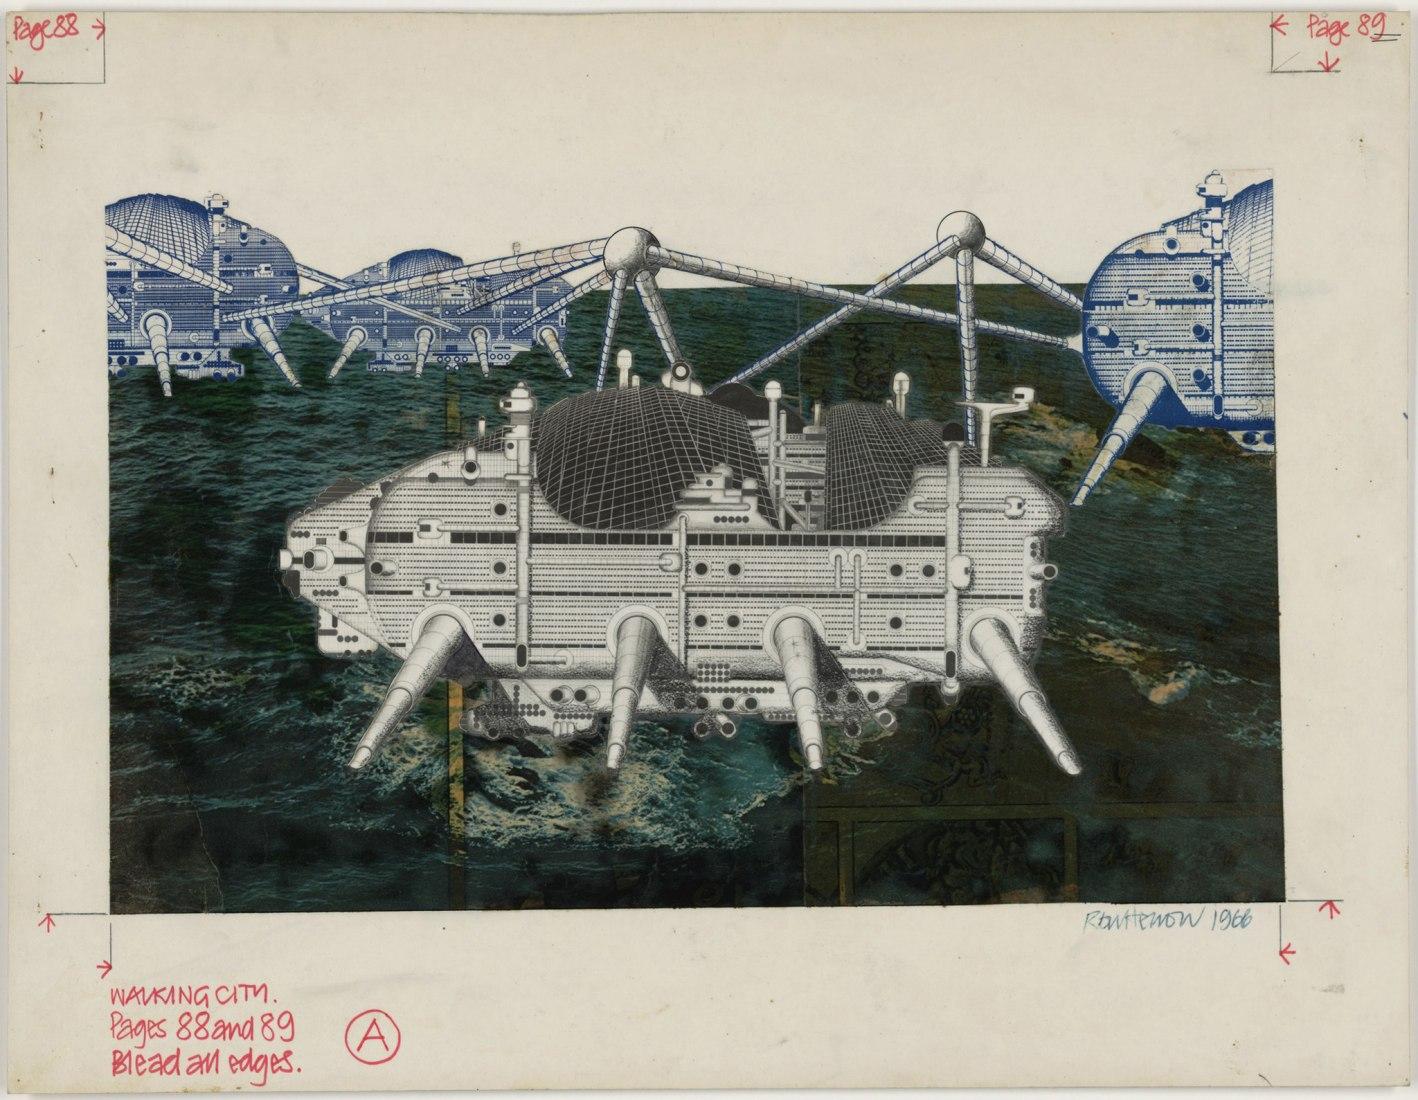 Archigram, Ron  Herron, Walking City on the  Ocean Project, 1964 -1966